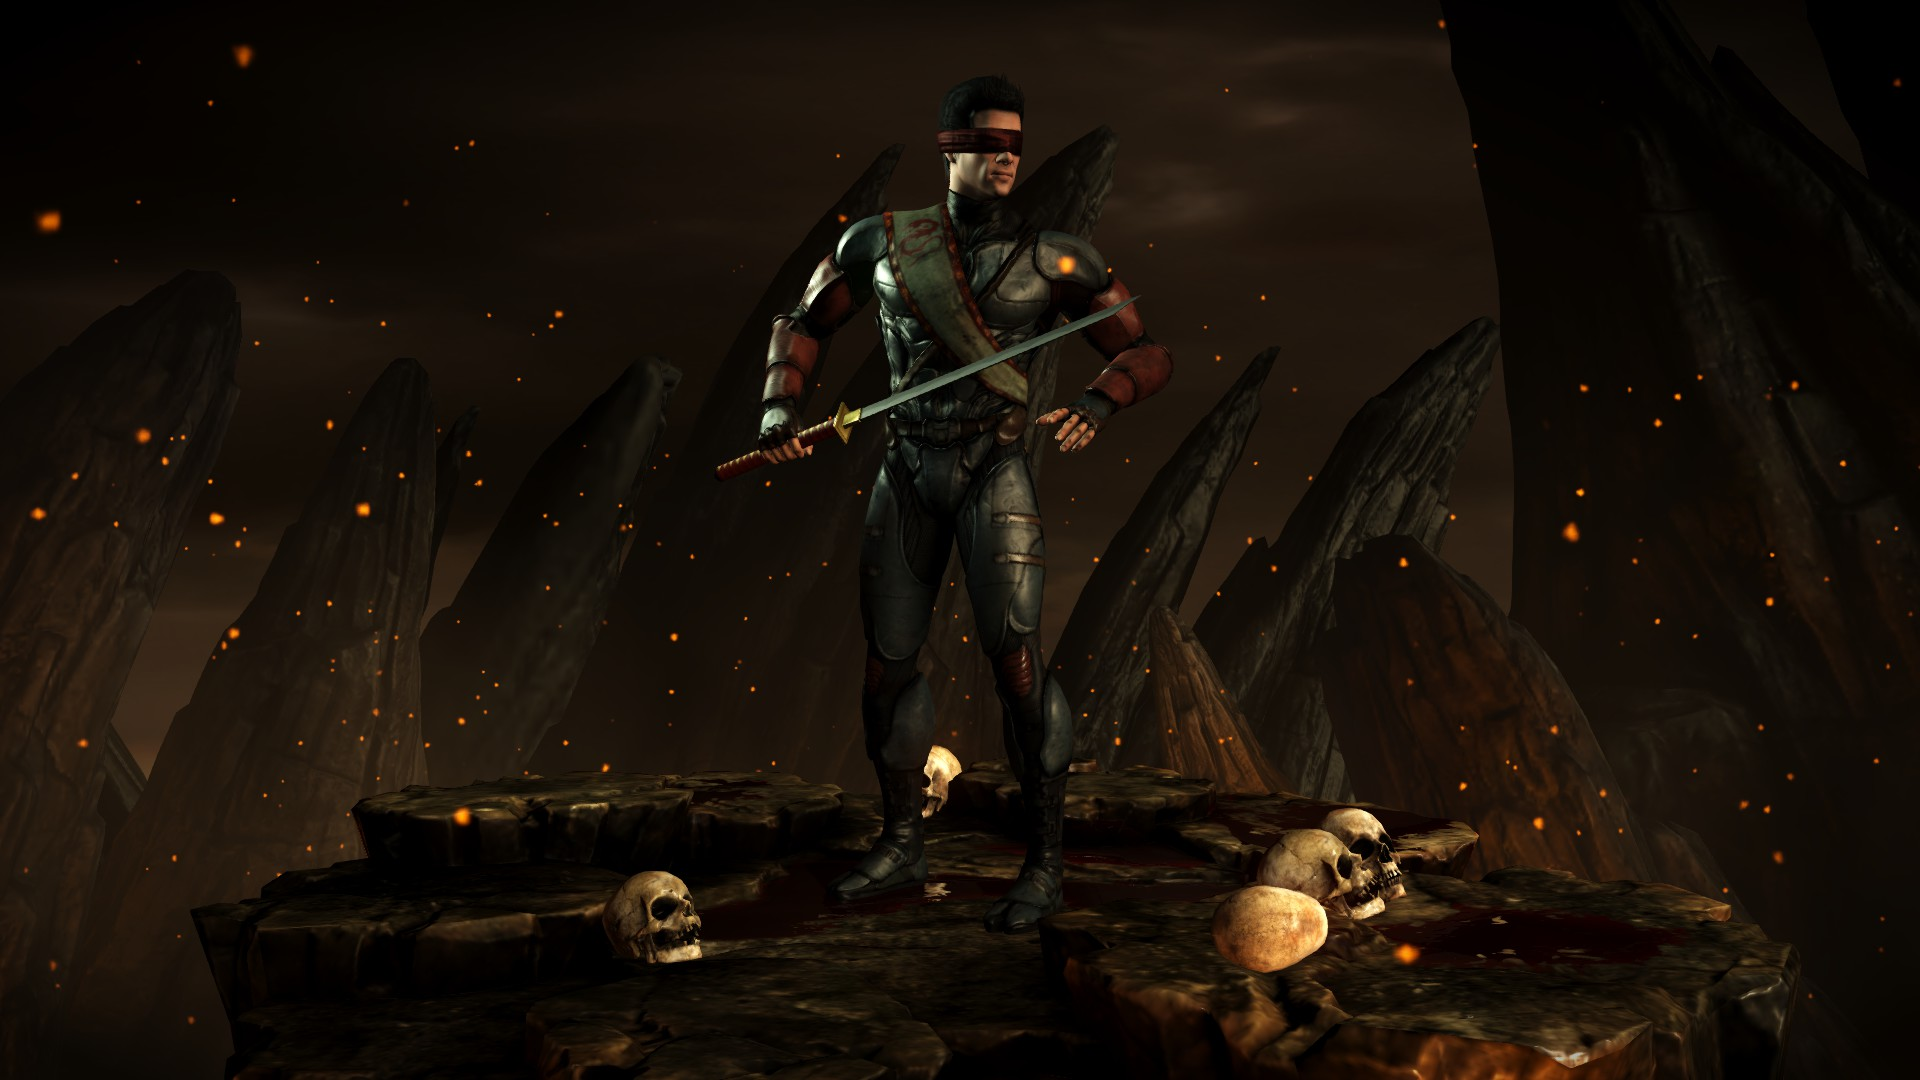 Кенши (Костюм: Турнир) - Mortal Kombat X Кенши